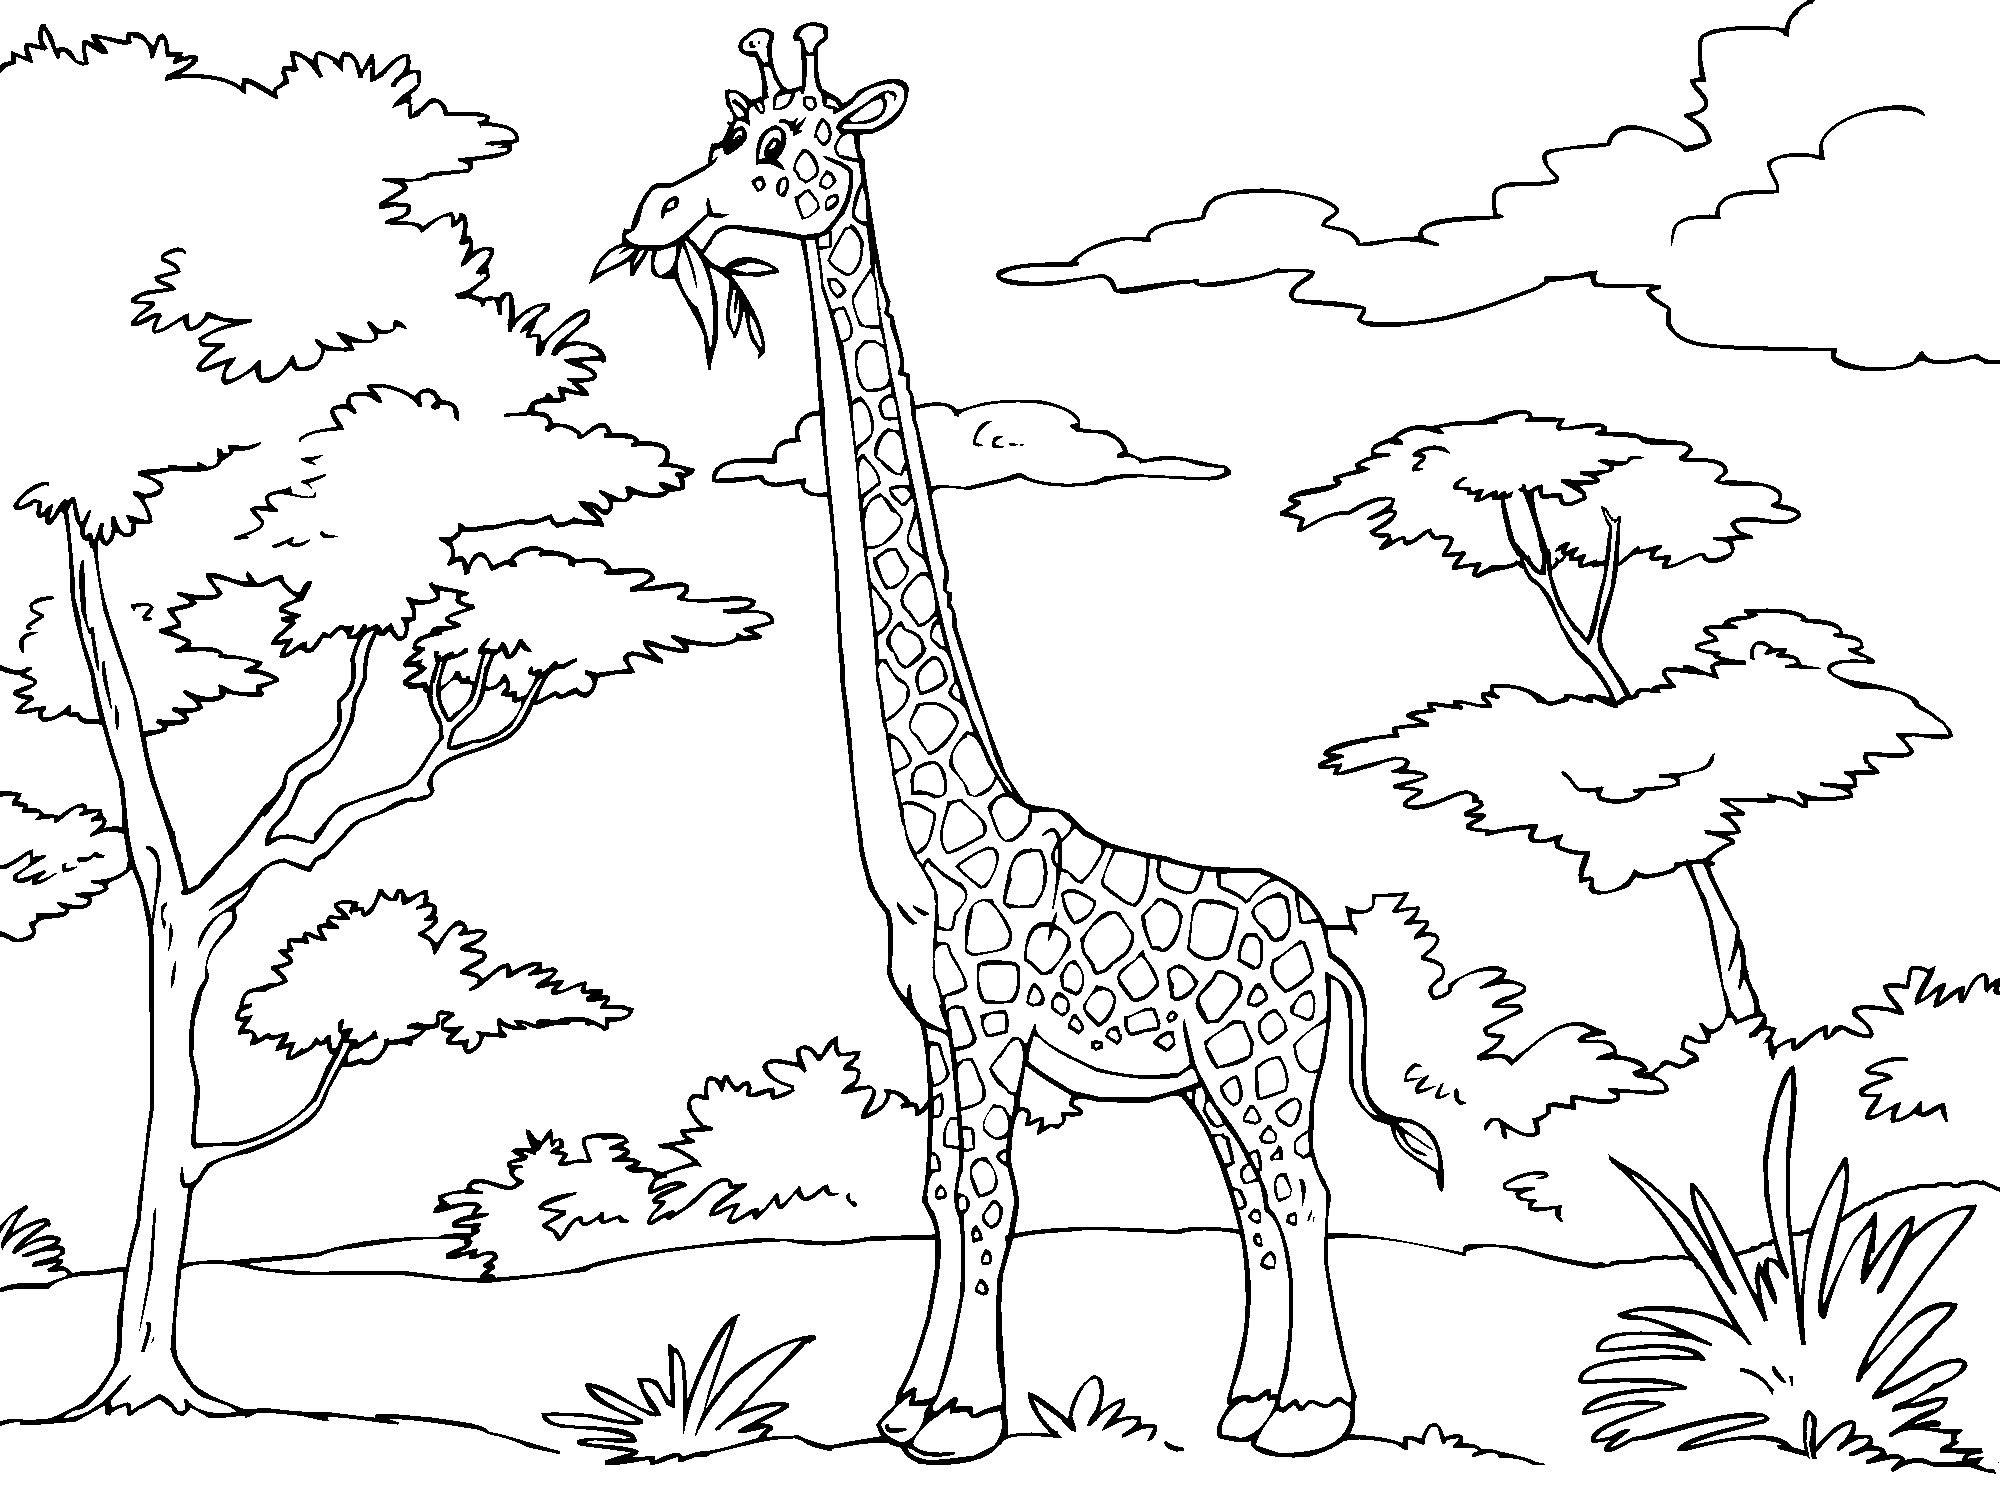 Dibujo para colorear jirafa - Img 23012